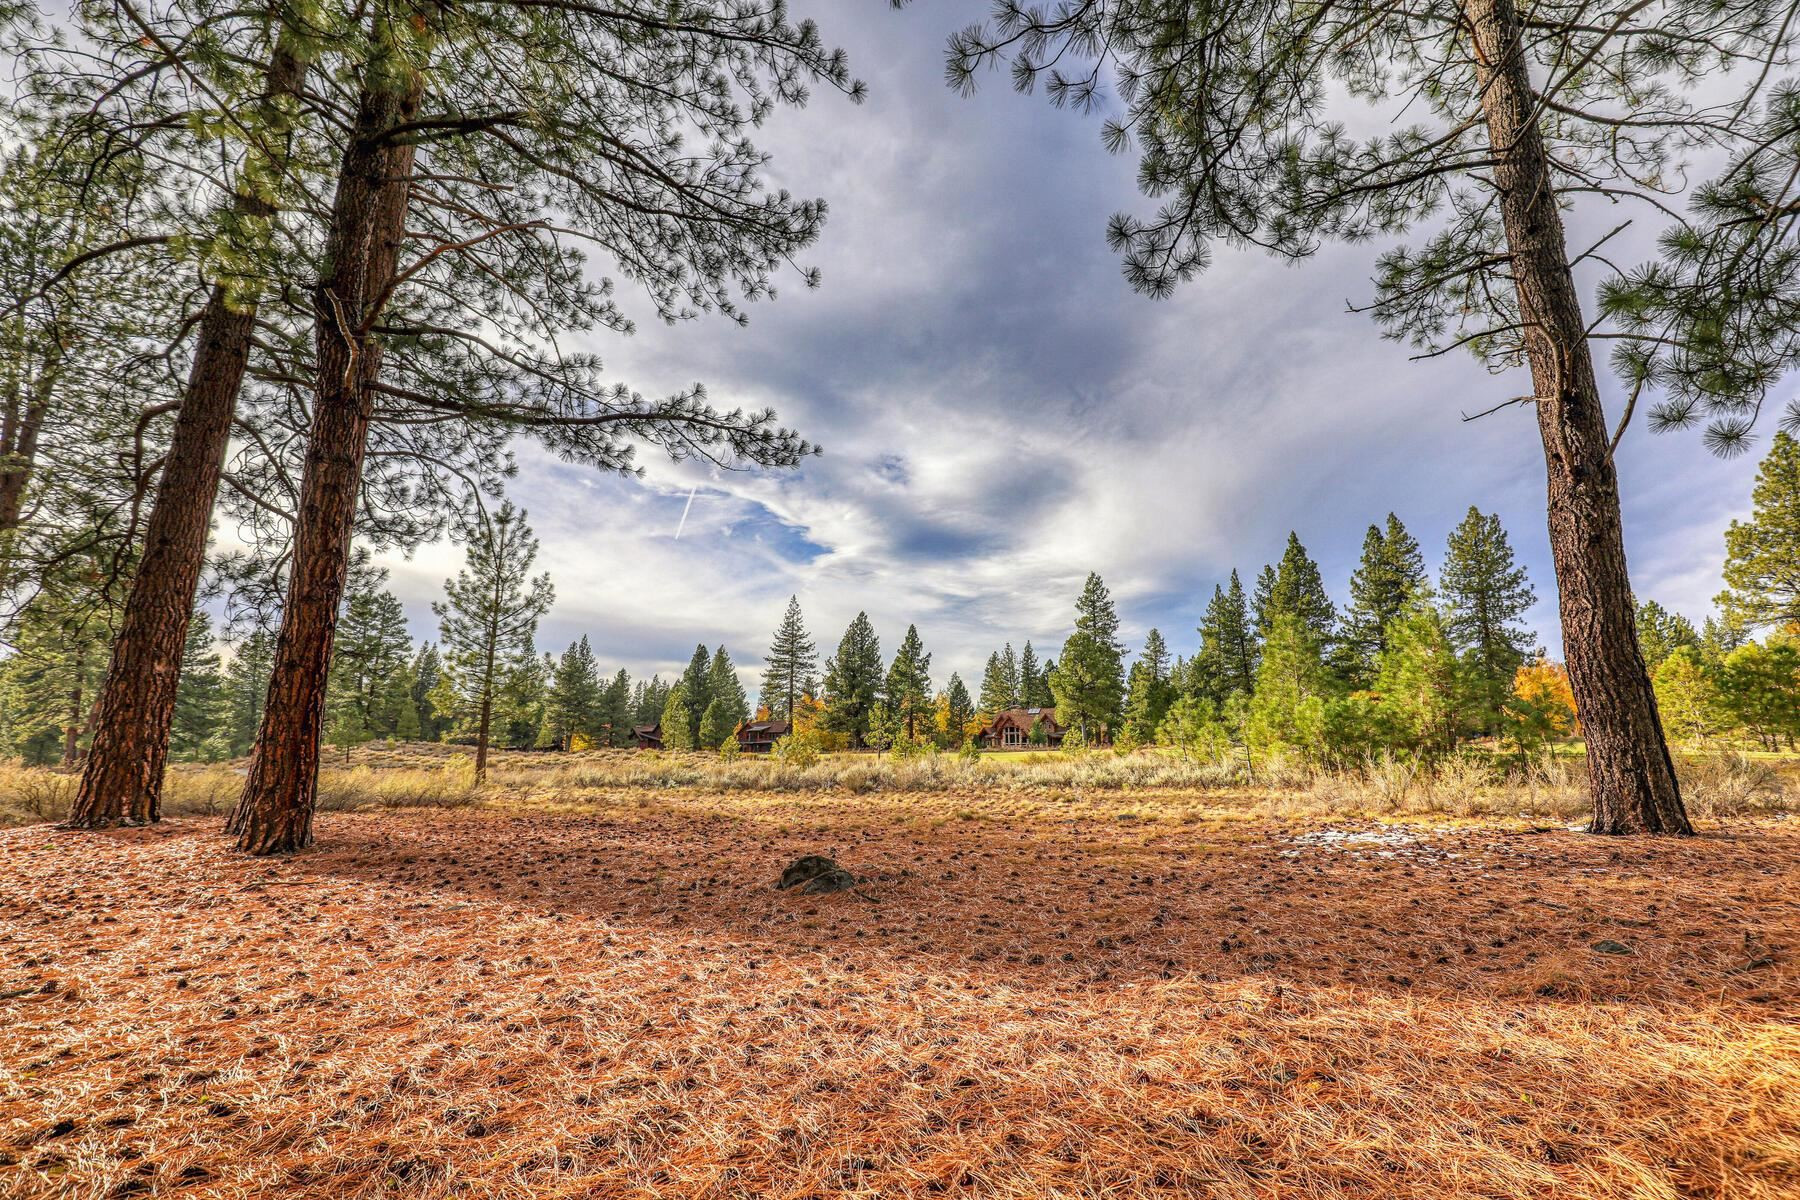 Image for 13058 Lookout Loop, Truckee, CA 96161-4321